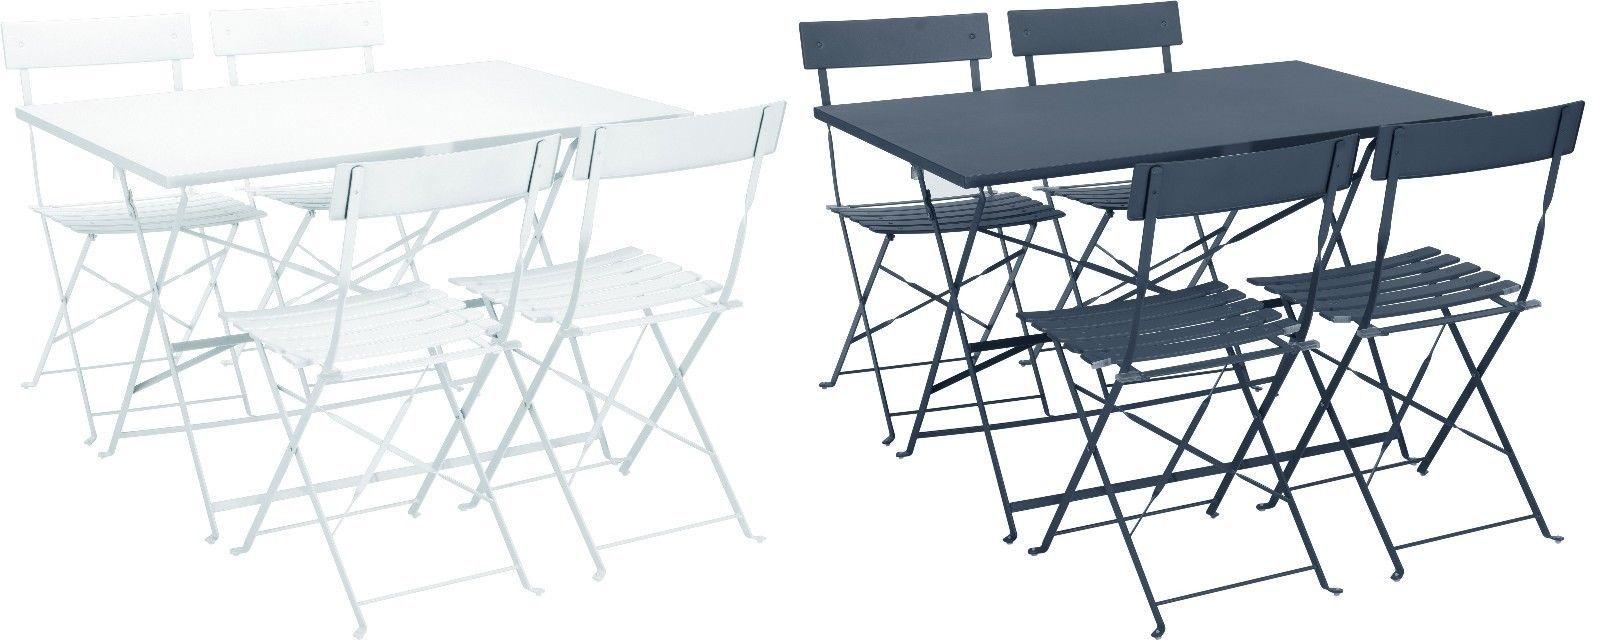 Gartenmobel Tisch Stuhl Bistro Klapptisch Klappstuhl G